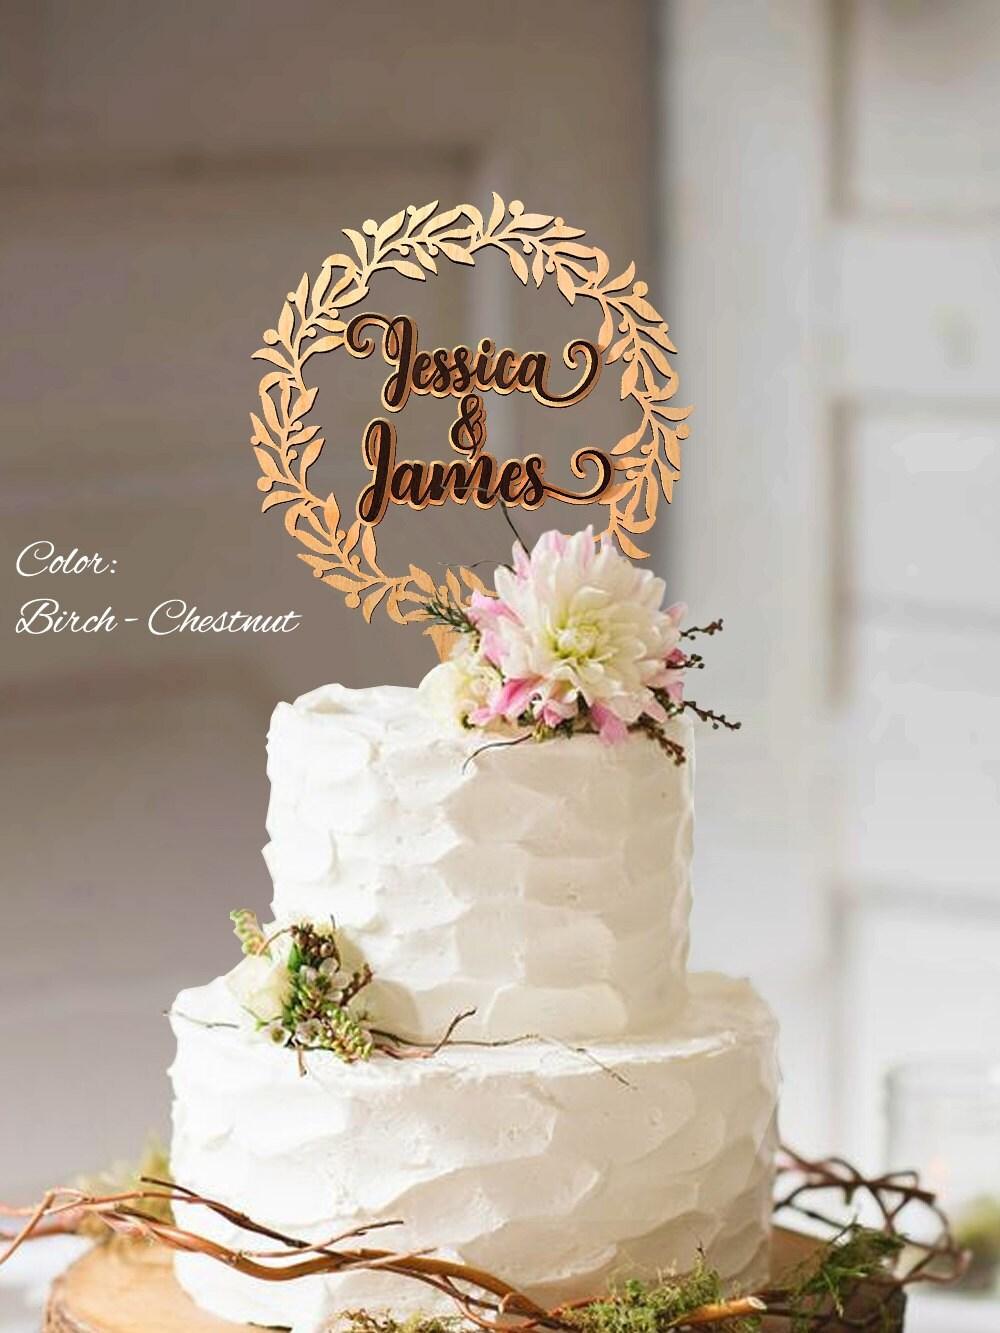 Cake Topper Wedding Rustic Wedding Cake Topper Wreath Cake